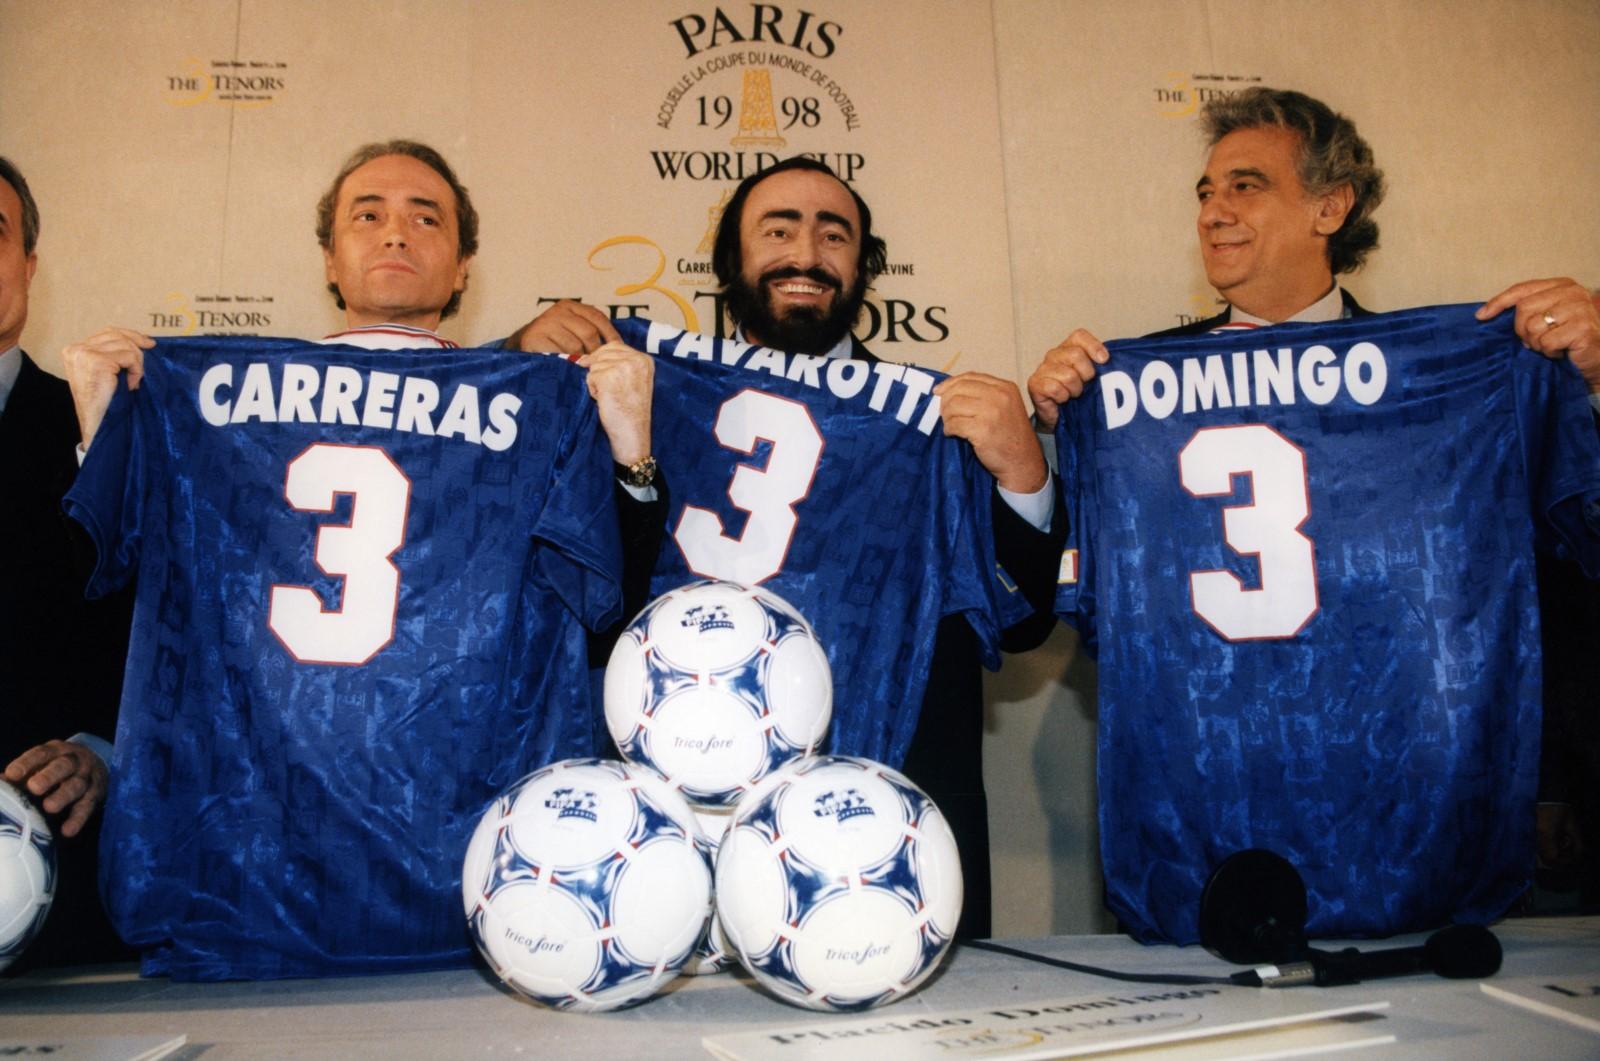 Pavarotti Photo José Carreras, Luciano Pavarotti, Plácido Domingo critique avis